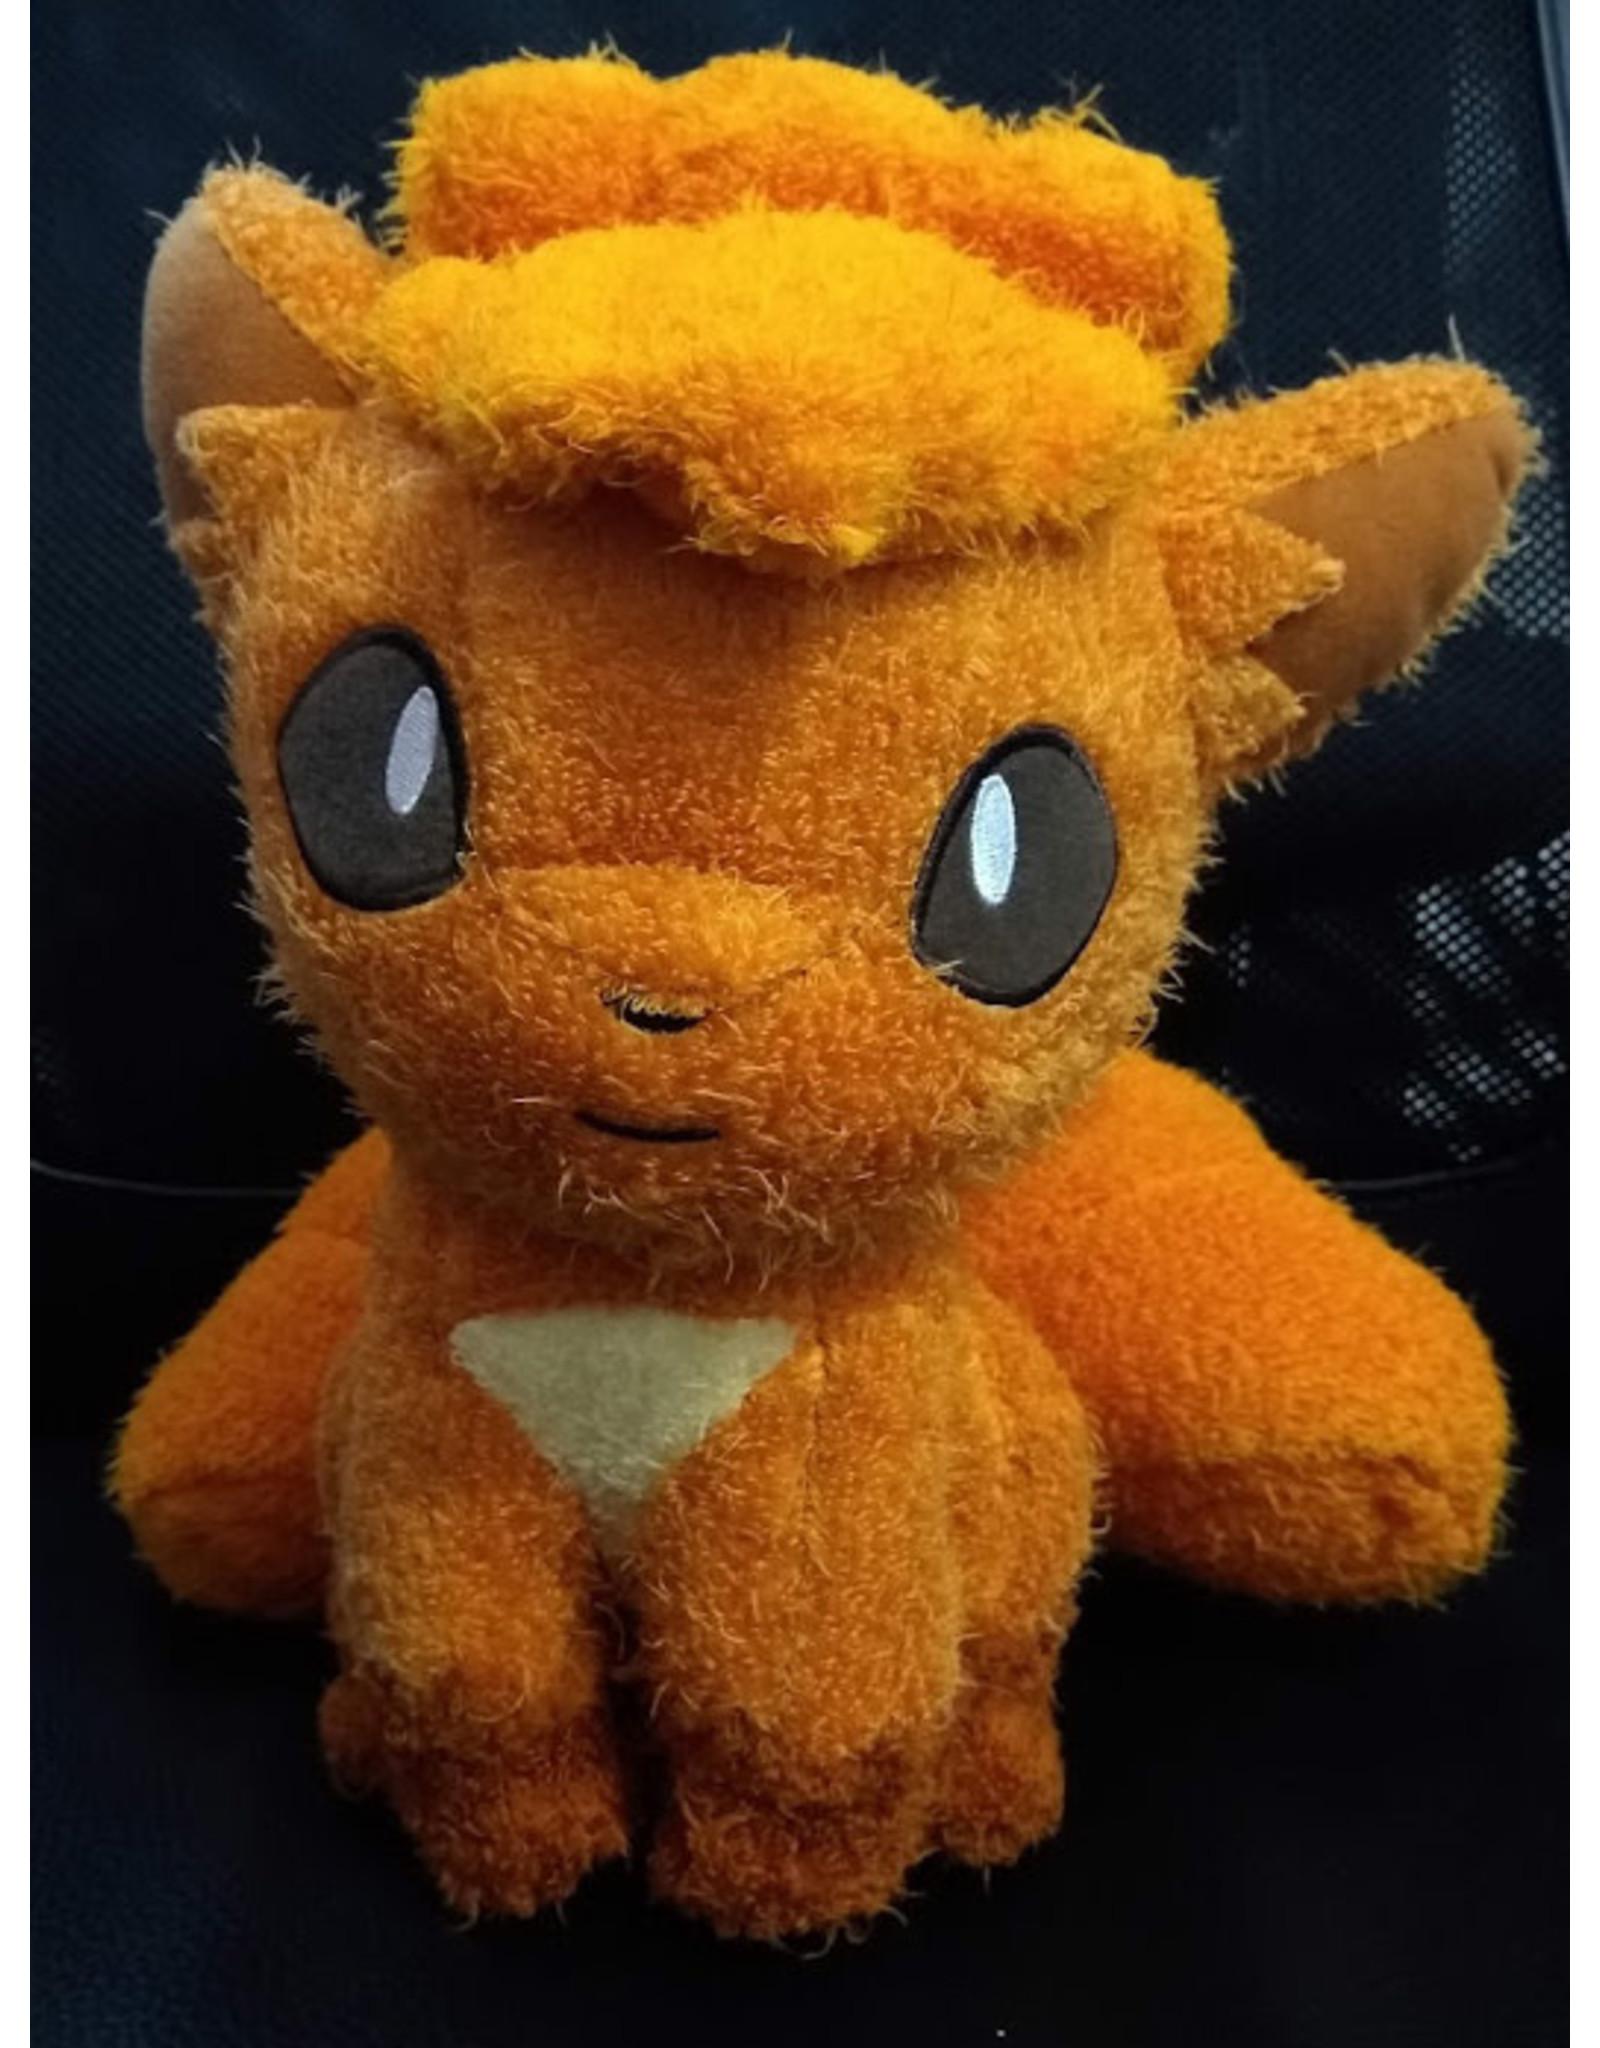 Vulpix - Pokemon Plushie - 30cm (Japanese import)